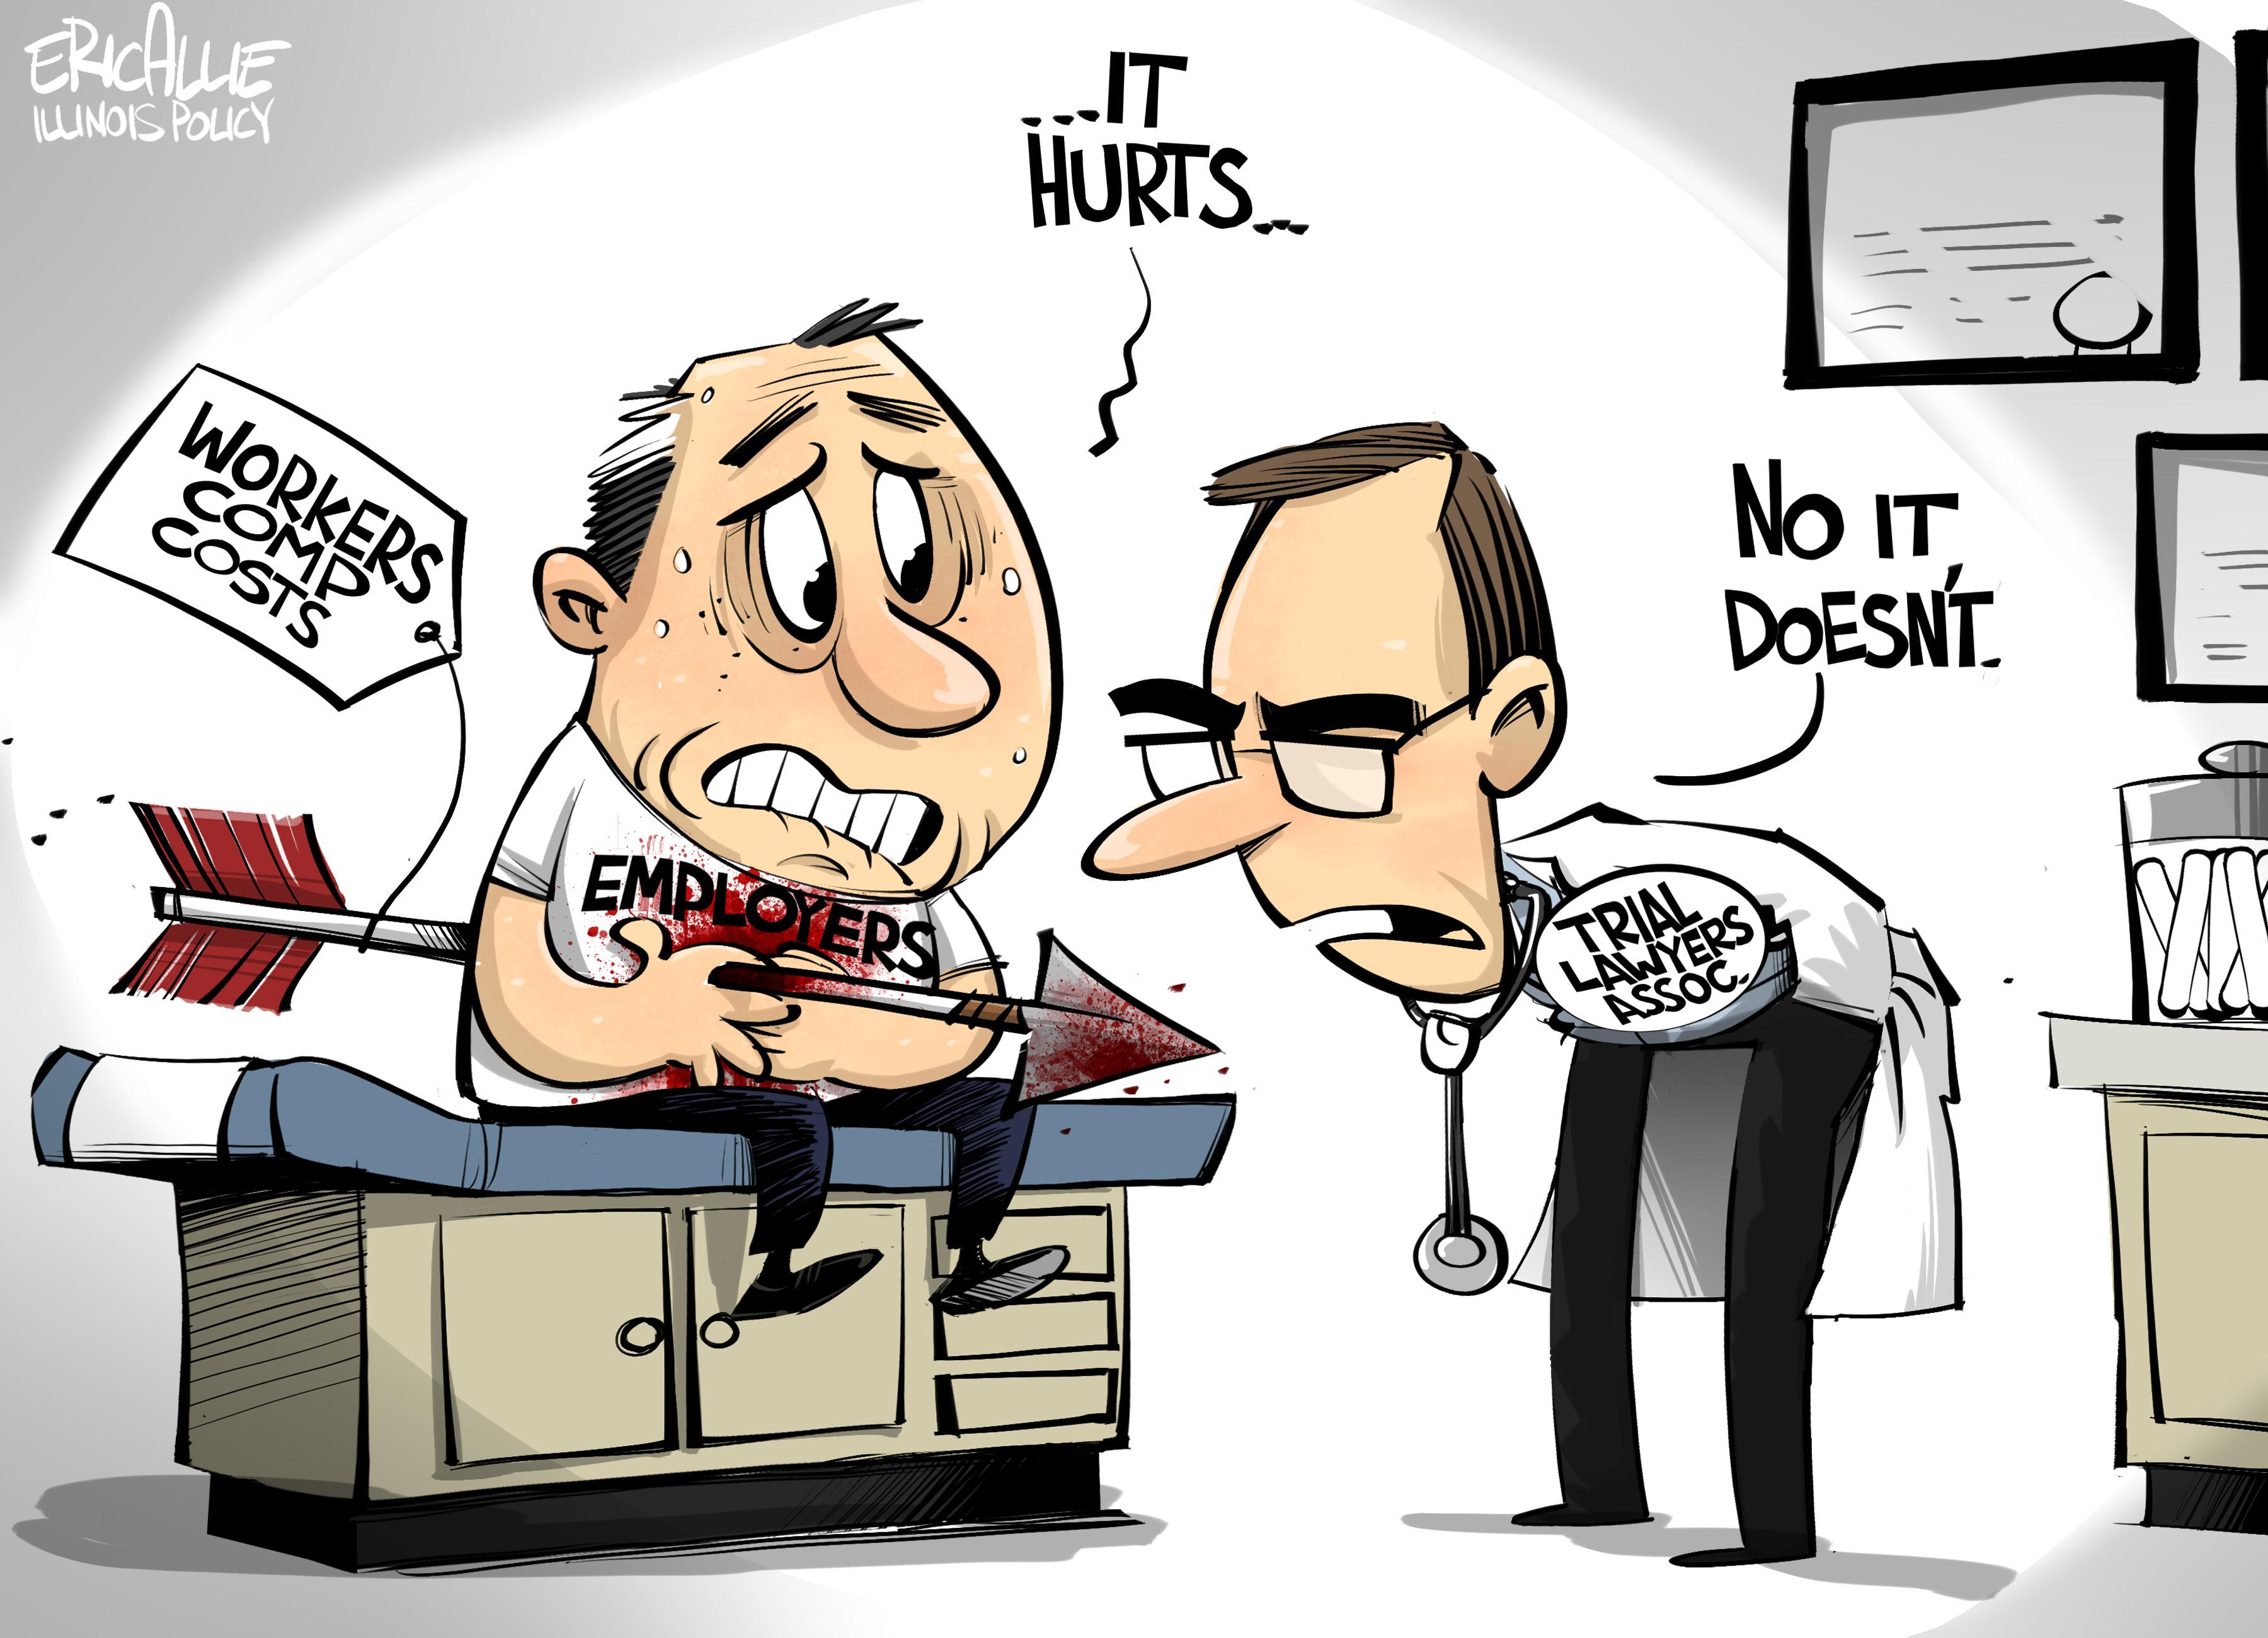 Illinois workers compensation wound – Eric Allie Cartoon